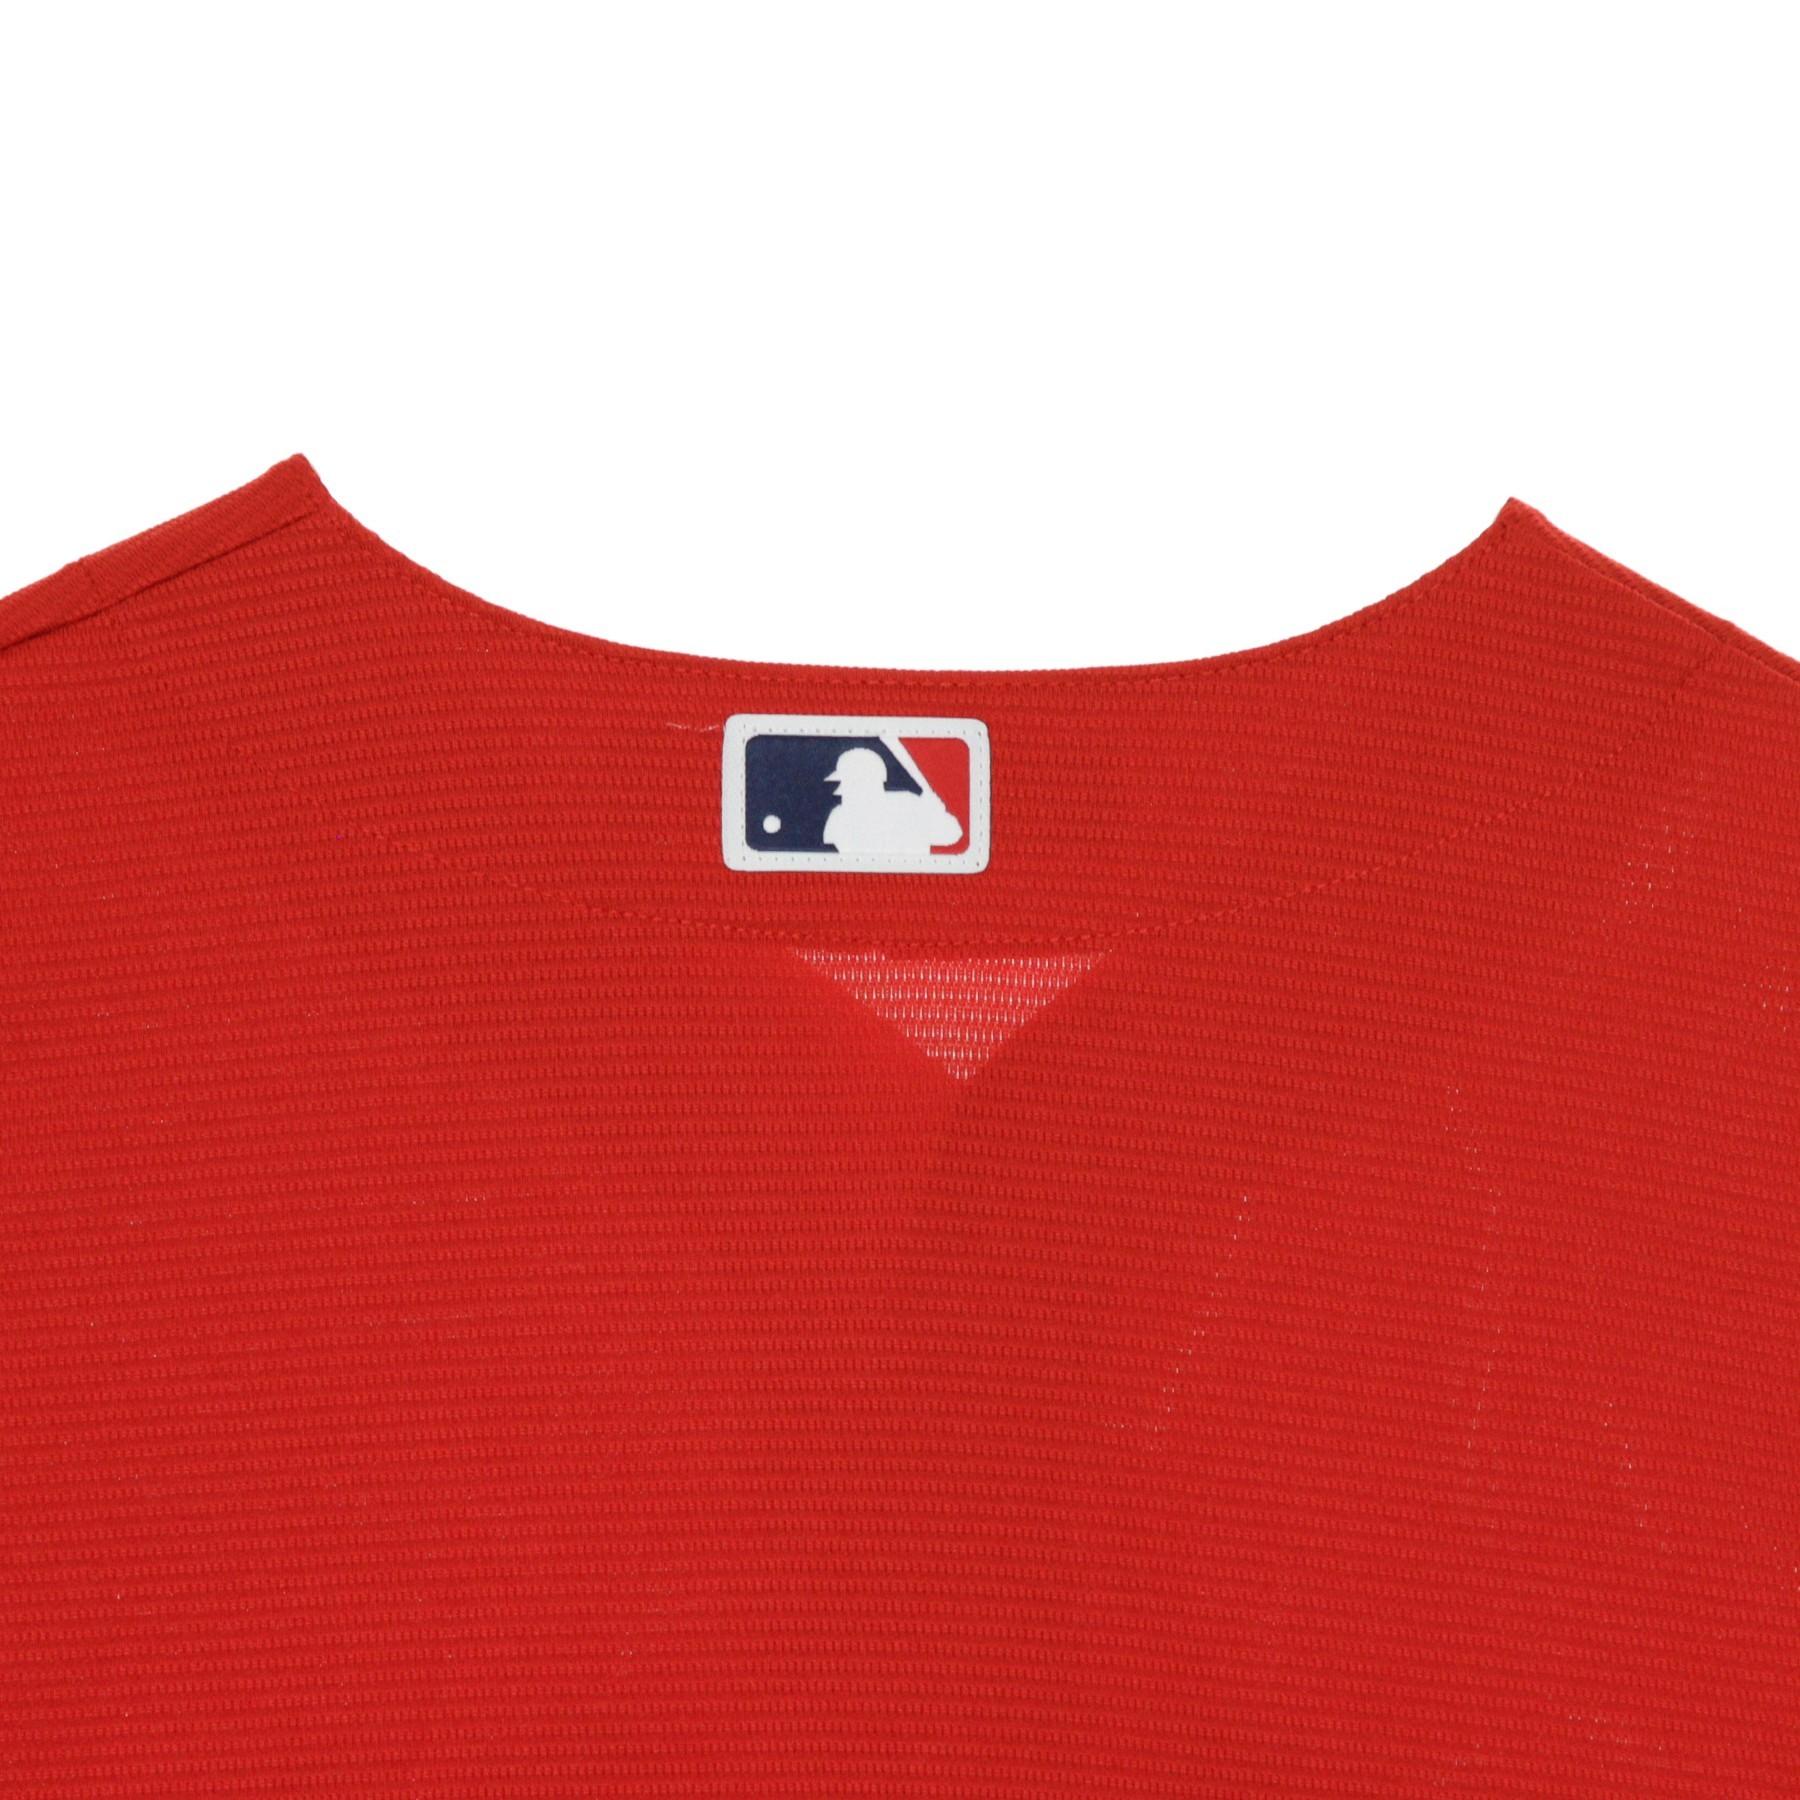 CASACCA BASEBALL MLB COOLBASE REPLICA JERSEY ALTERNATE BLANK BOSRED